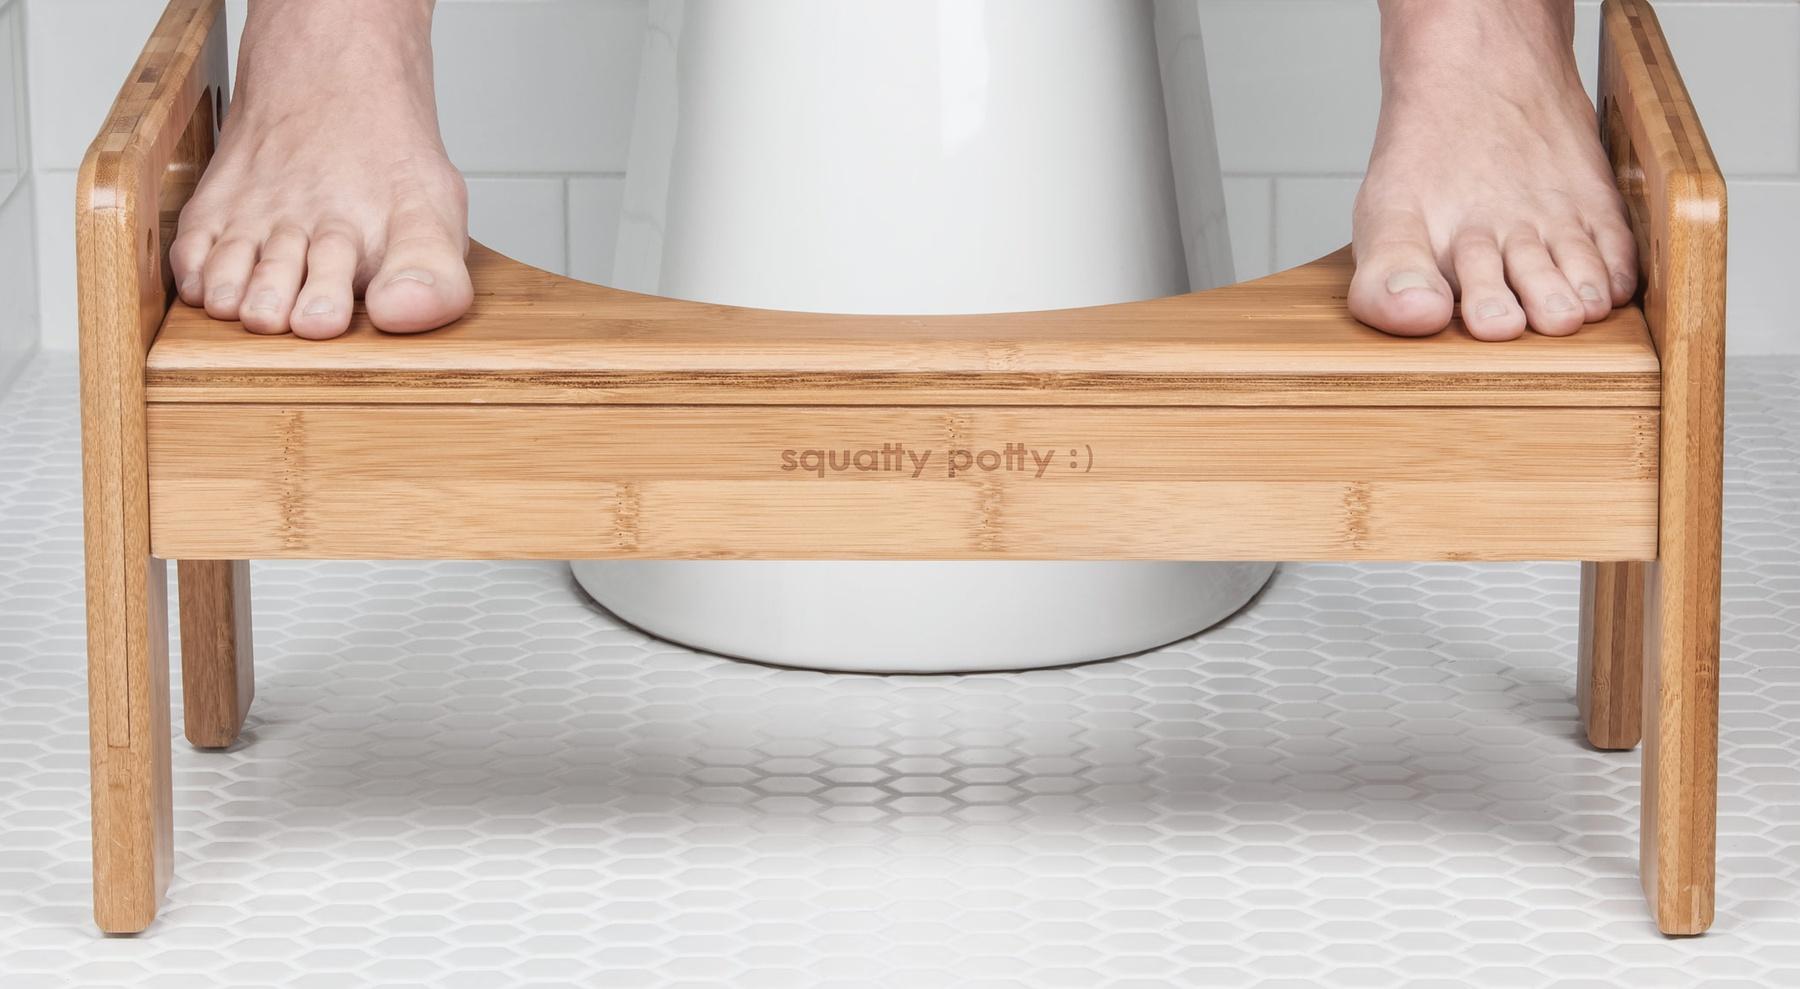 Squatty potty ® tao bamboo di squatty potty ®